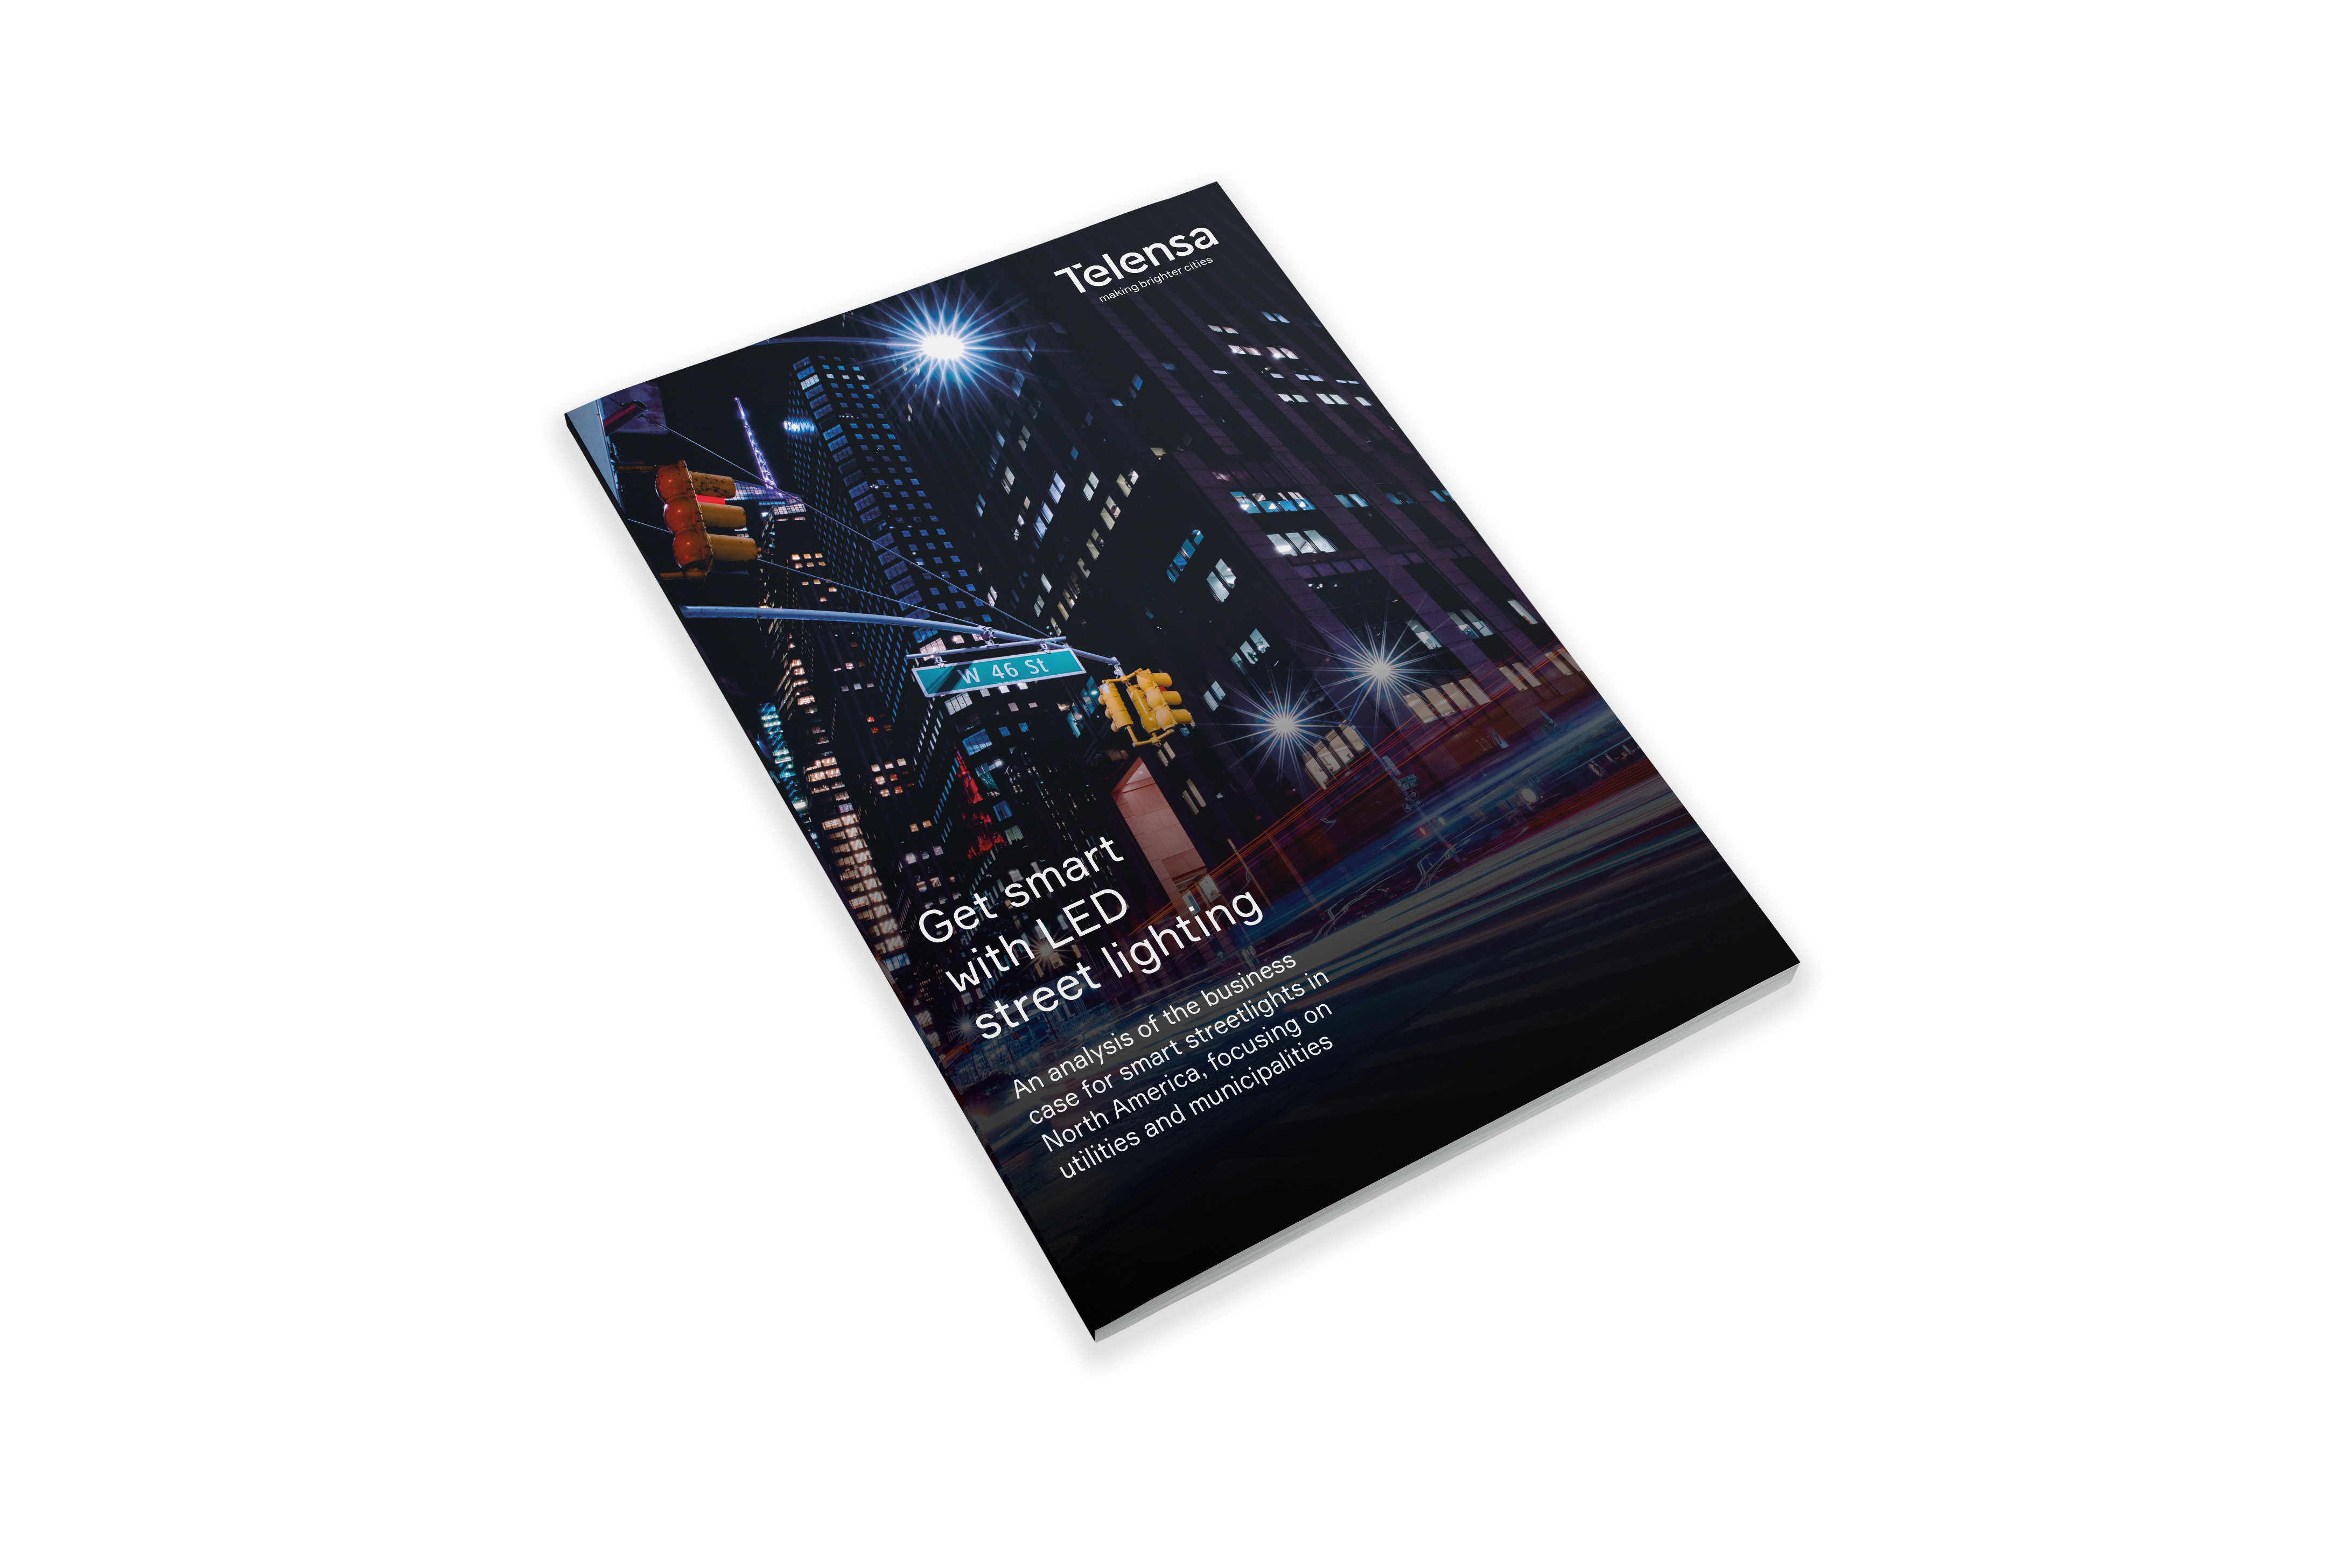 Get smart with LED street lighting